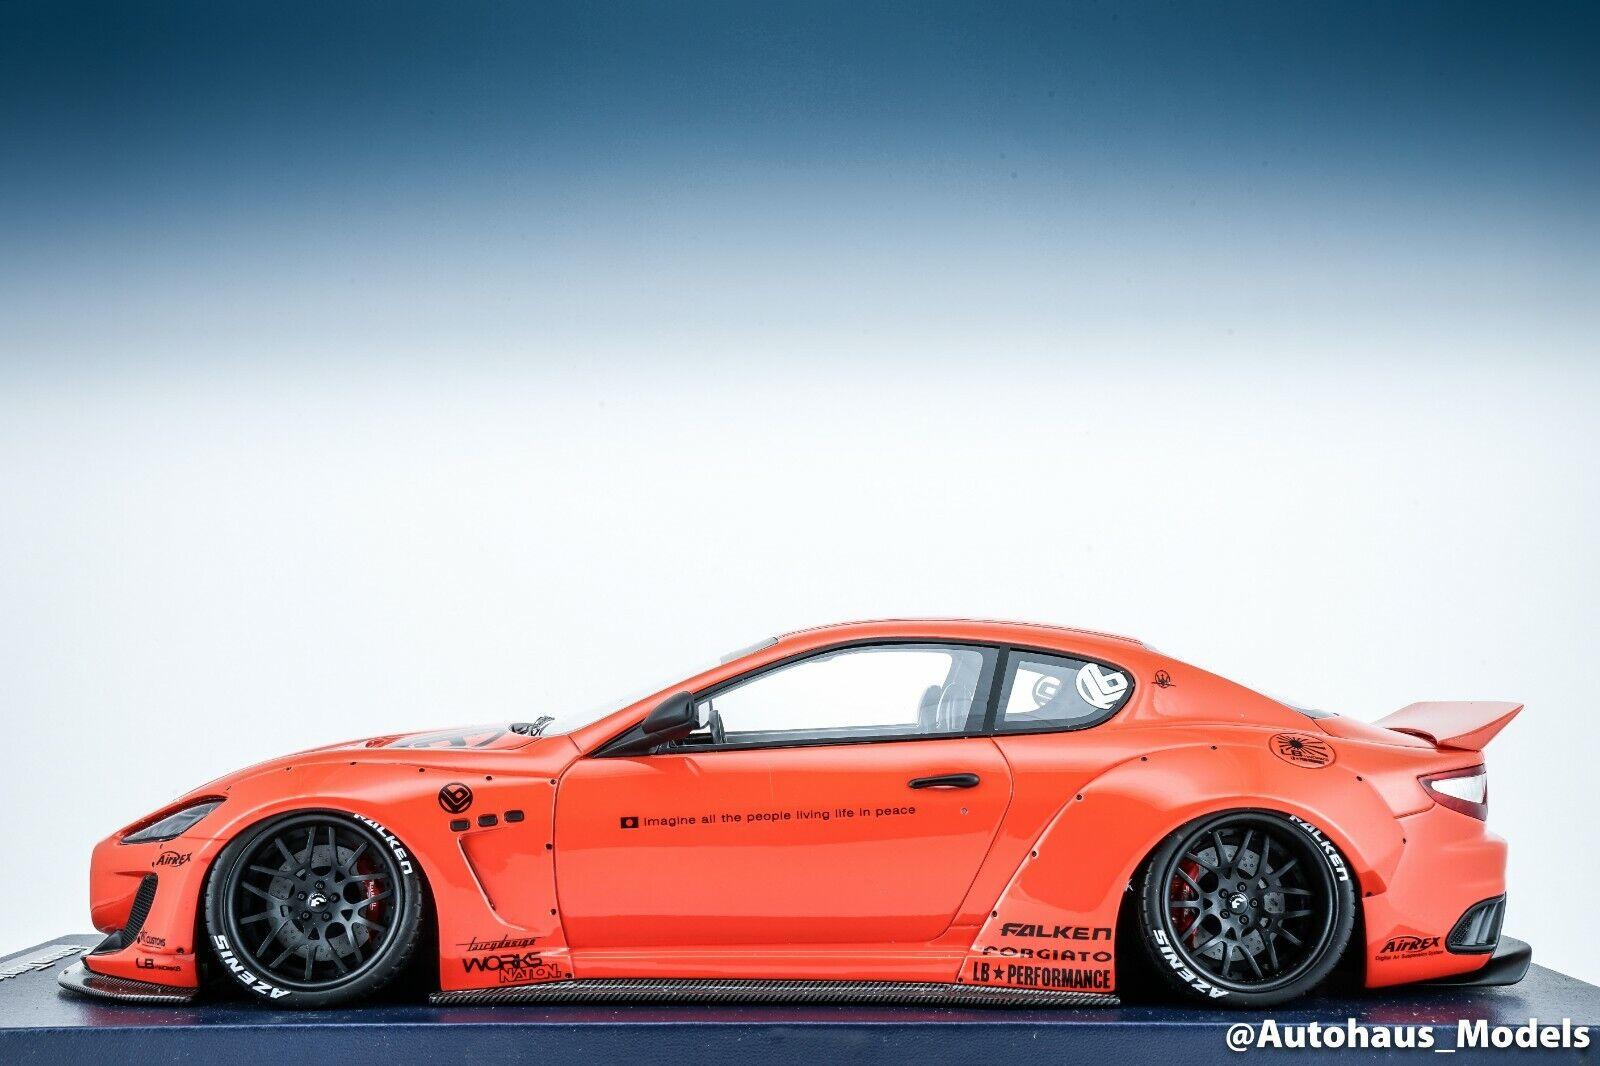 1 18 Modelos lb rendimiento Maserati GranTurismo ab Liberty Walk rosso